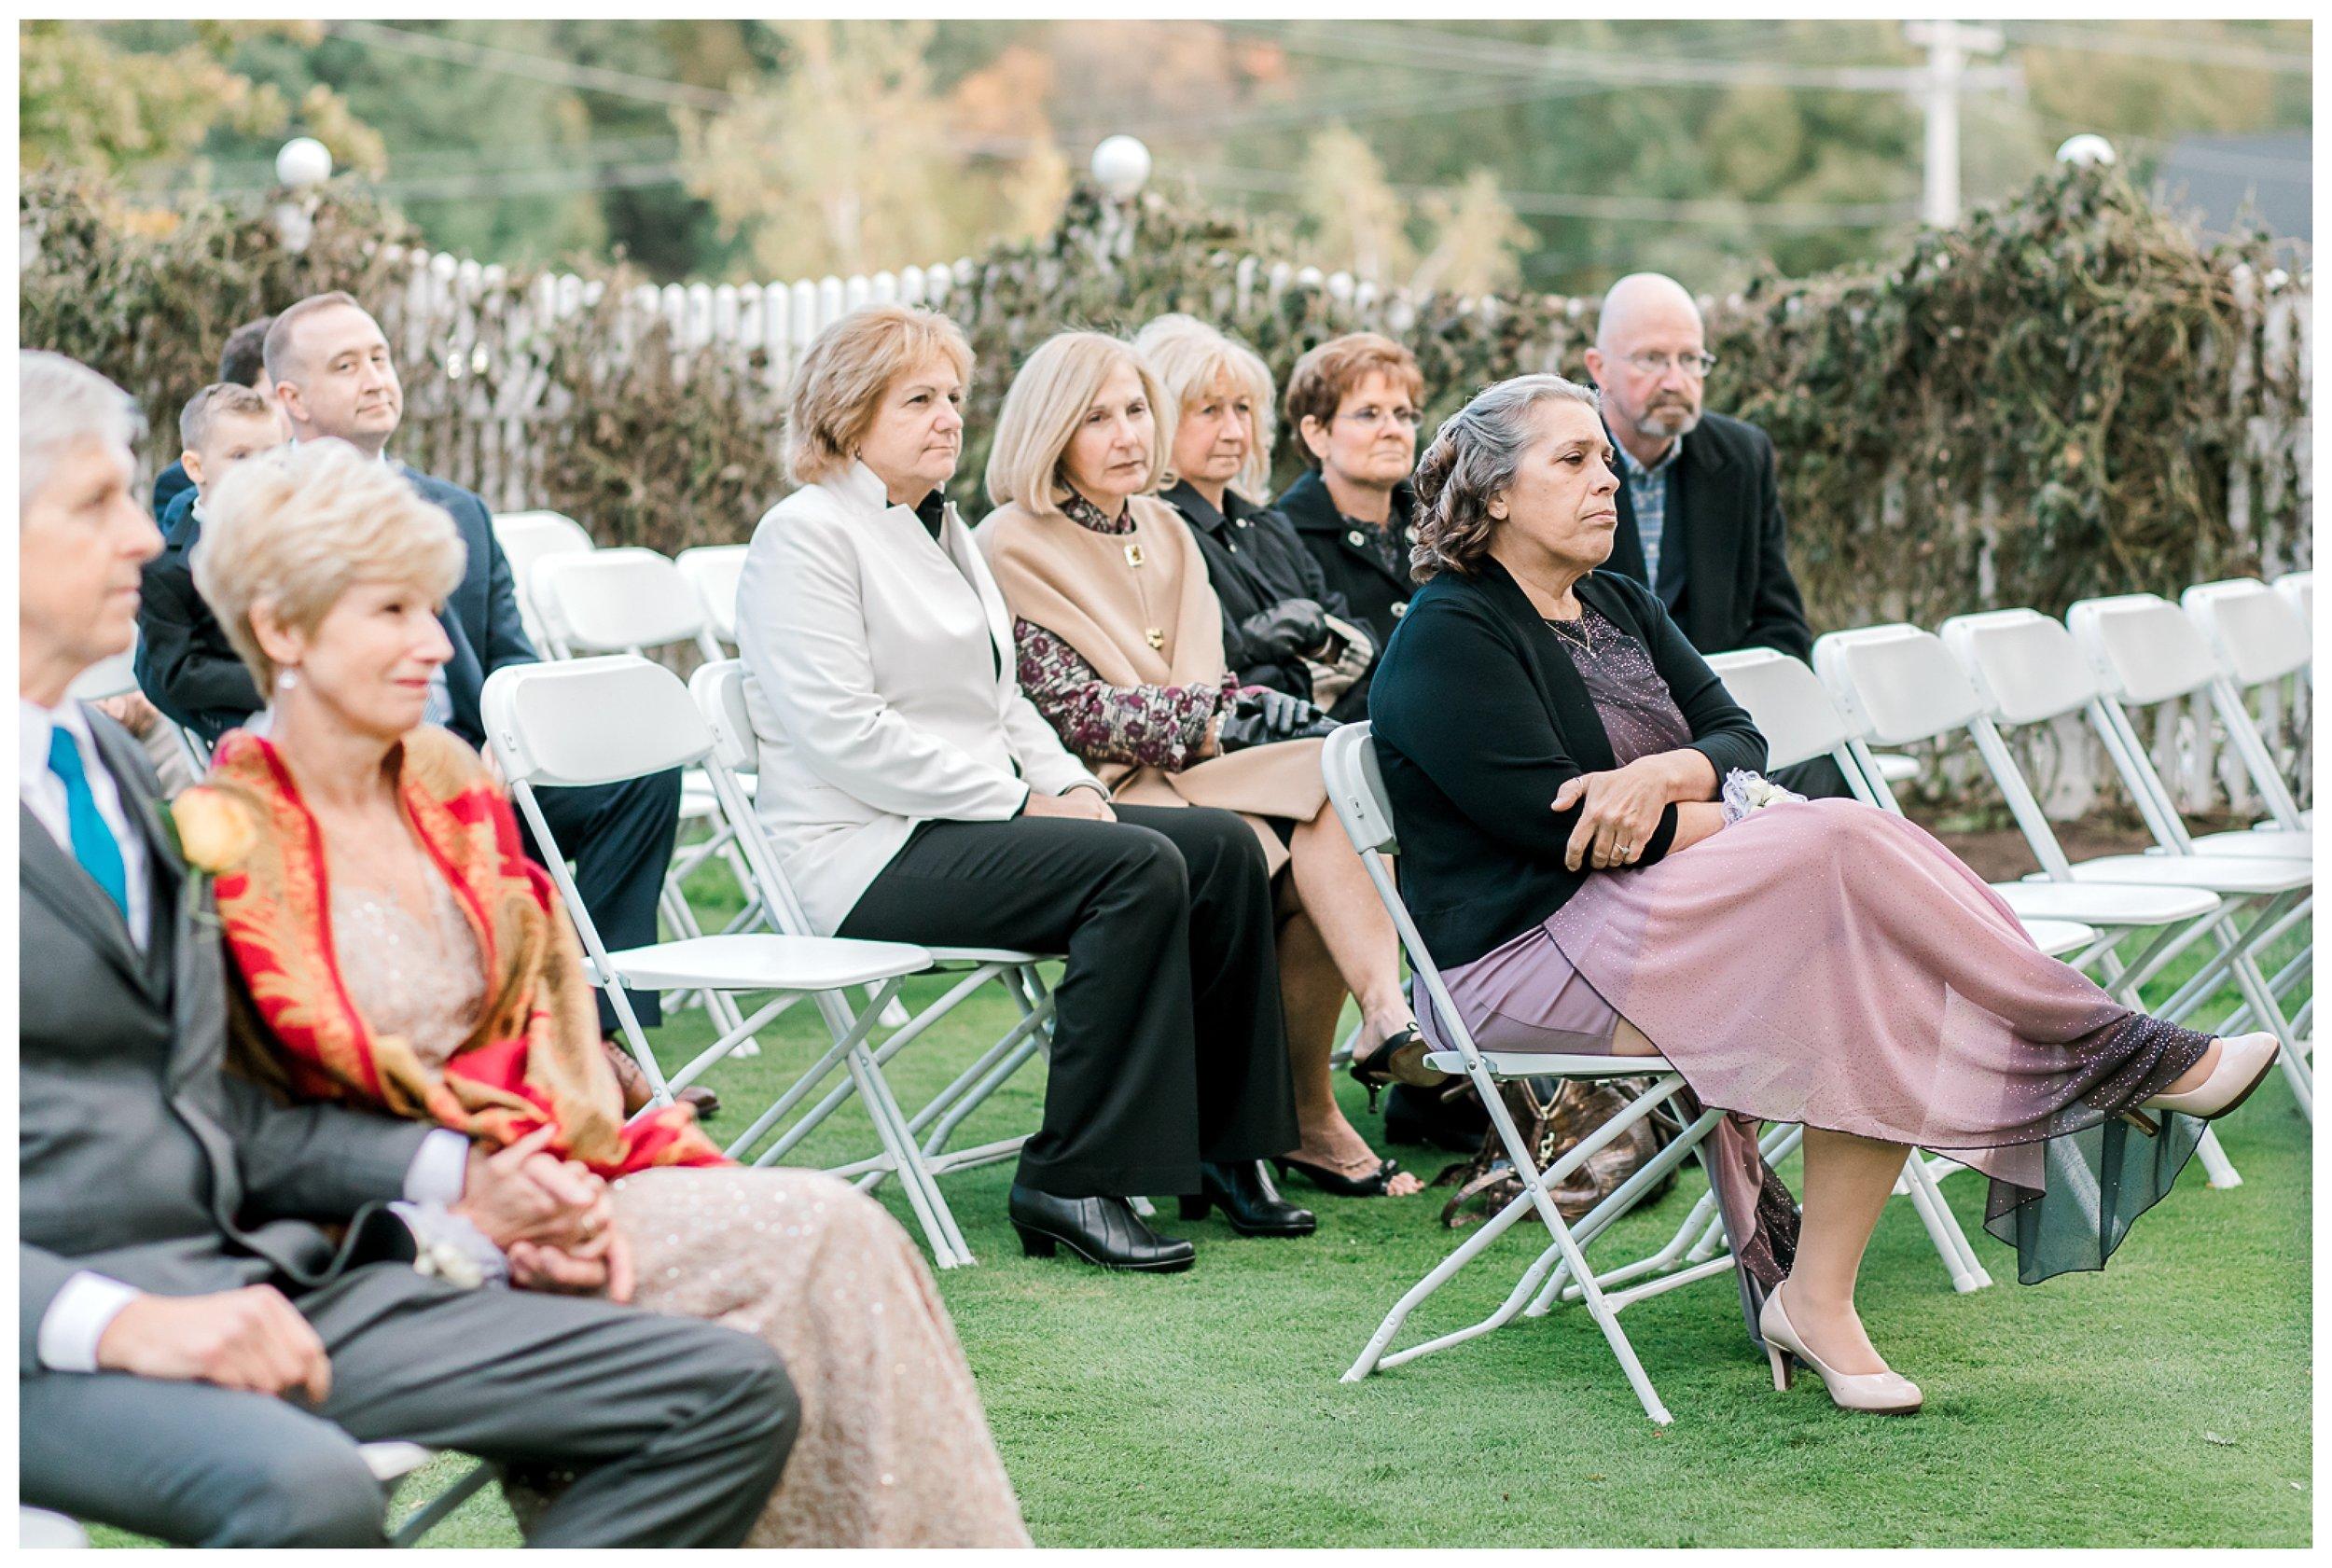 pleasant_valley_country_club_wedding_sutton_erica_pezente_photography (51).jpg